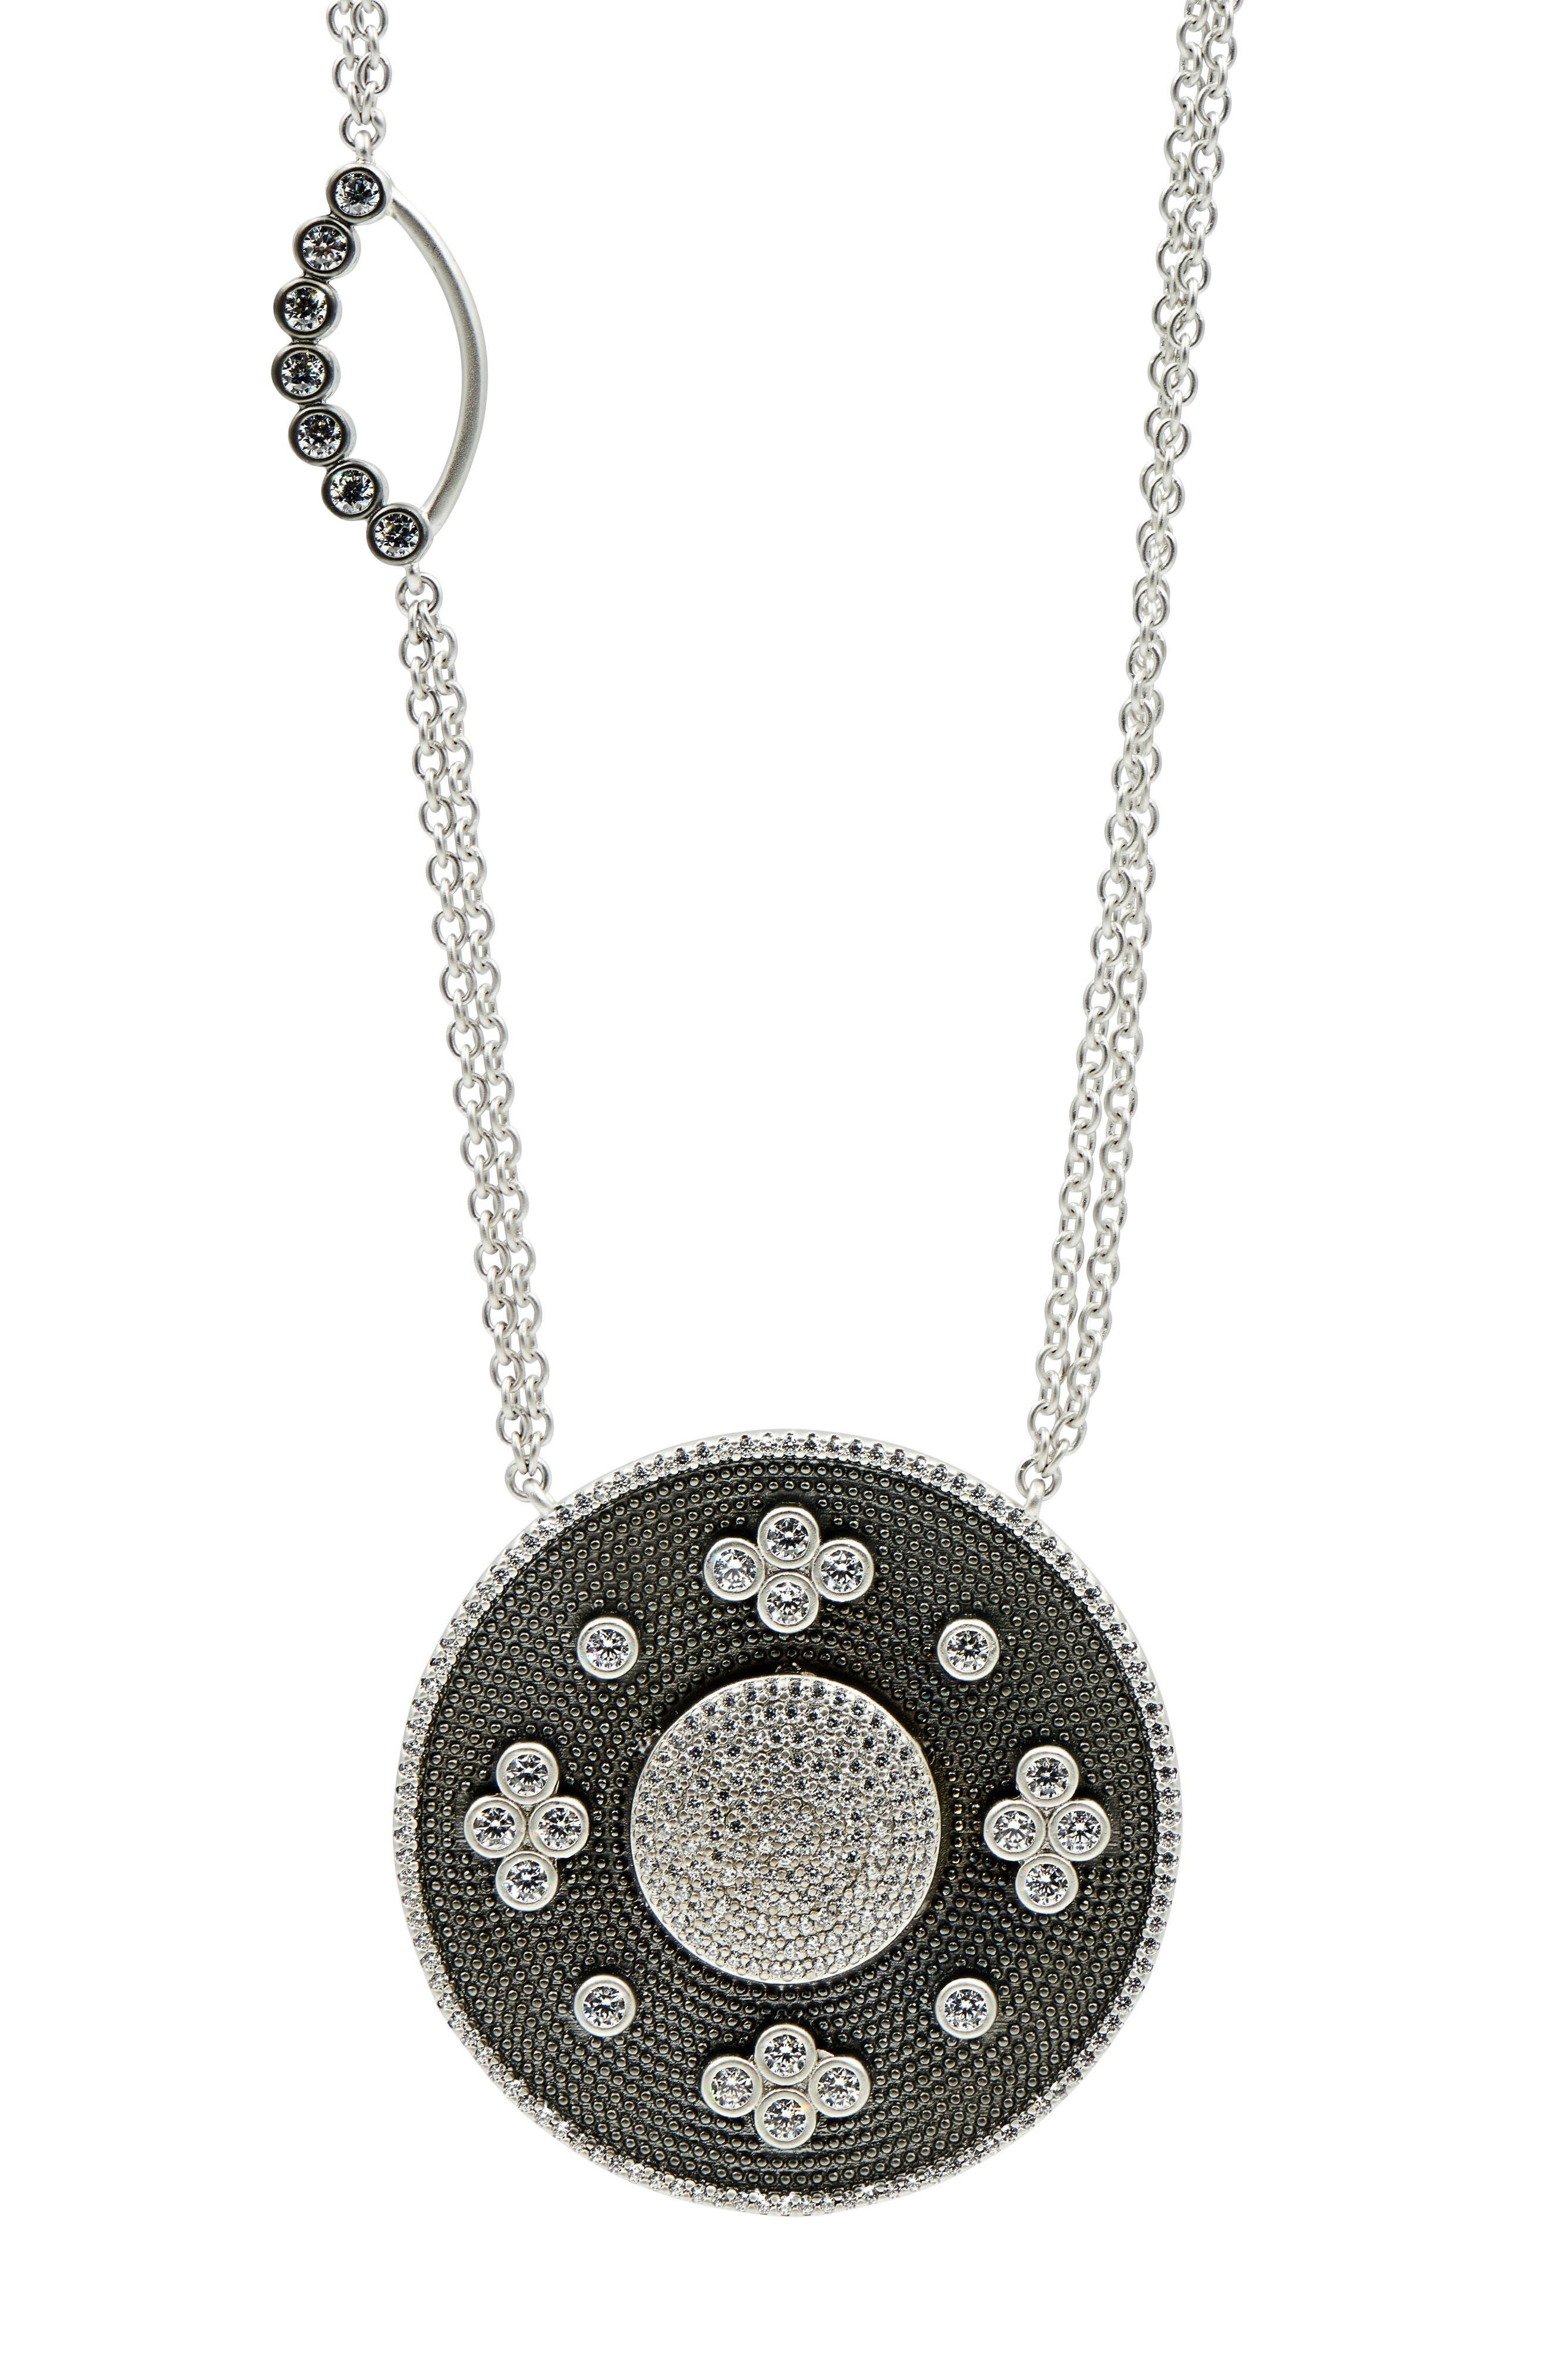 Industrial Finish Pendant Necklace,                             Alternate thumbnail 3, color,                             BLACK/ SILVER